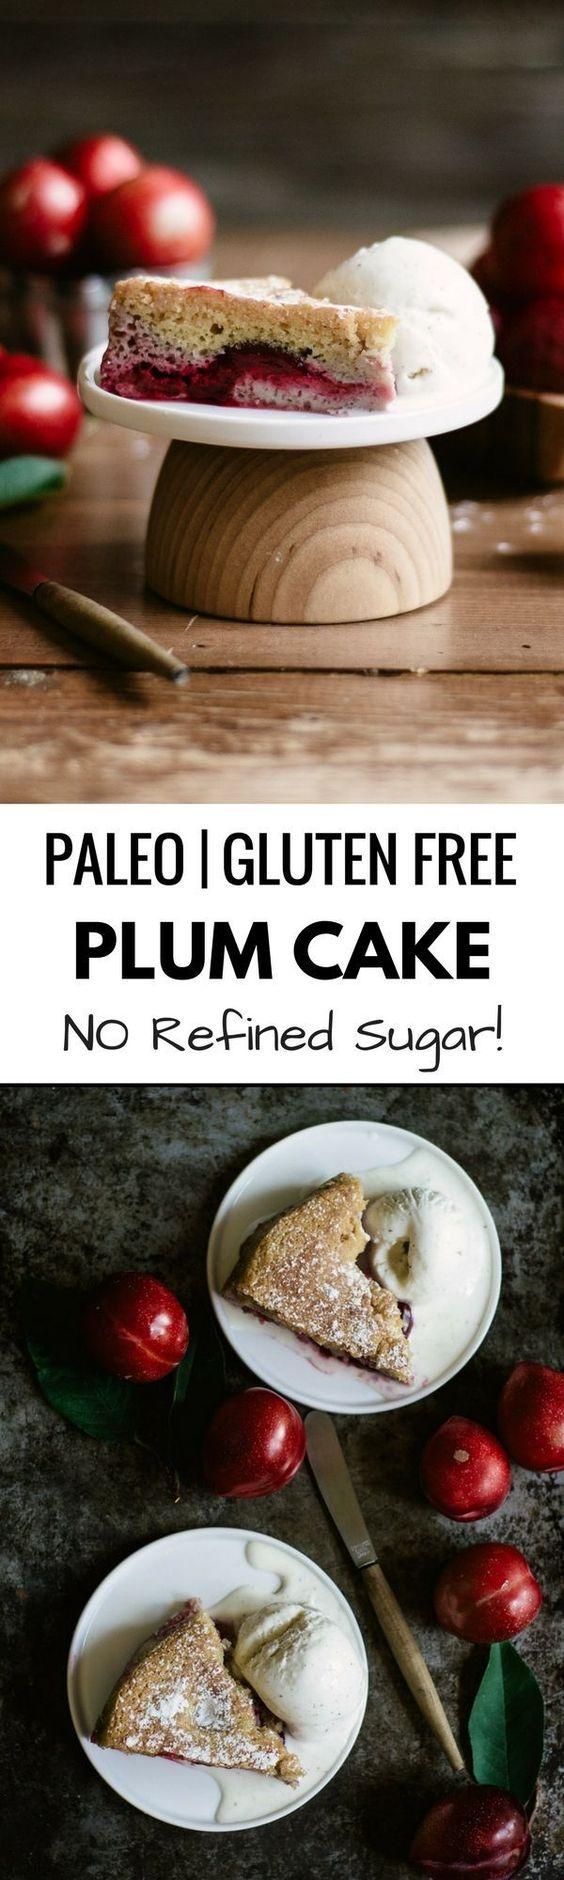 plum-cake-paleo-gluten-free